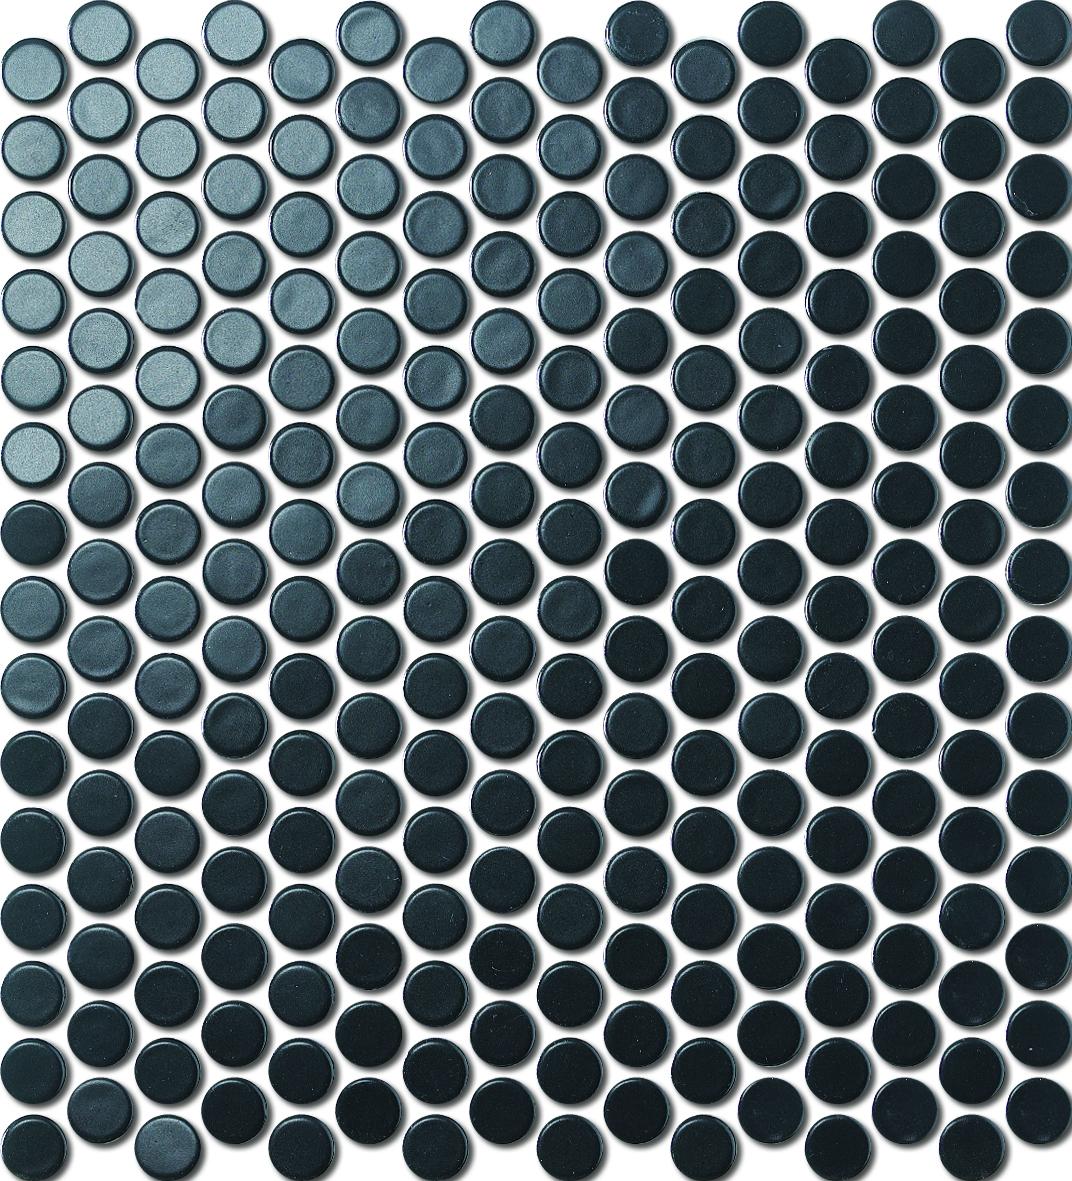 PENNY ROUND BLACK MATT HL0003 R10 19mm - Hansas Plaadimaailm